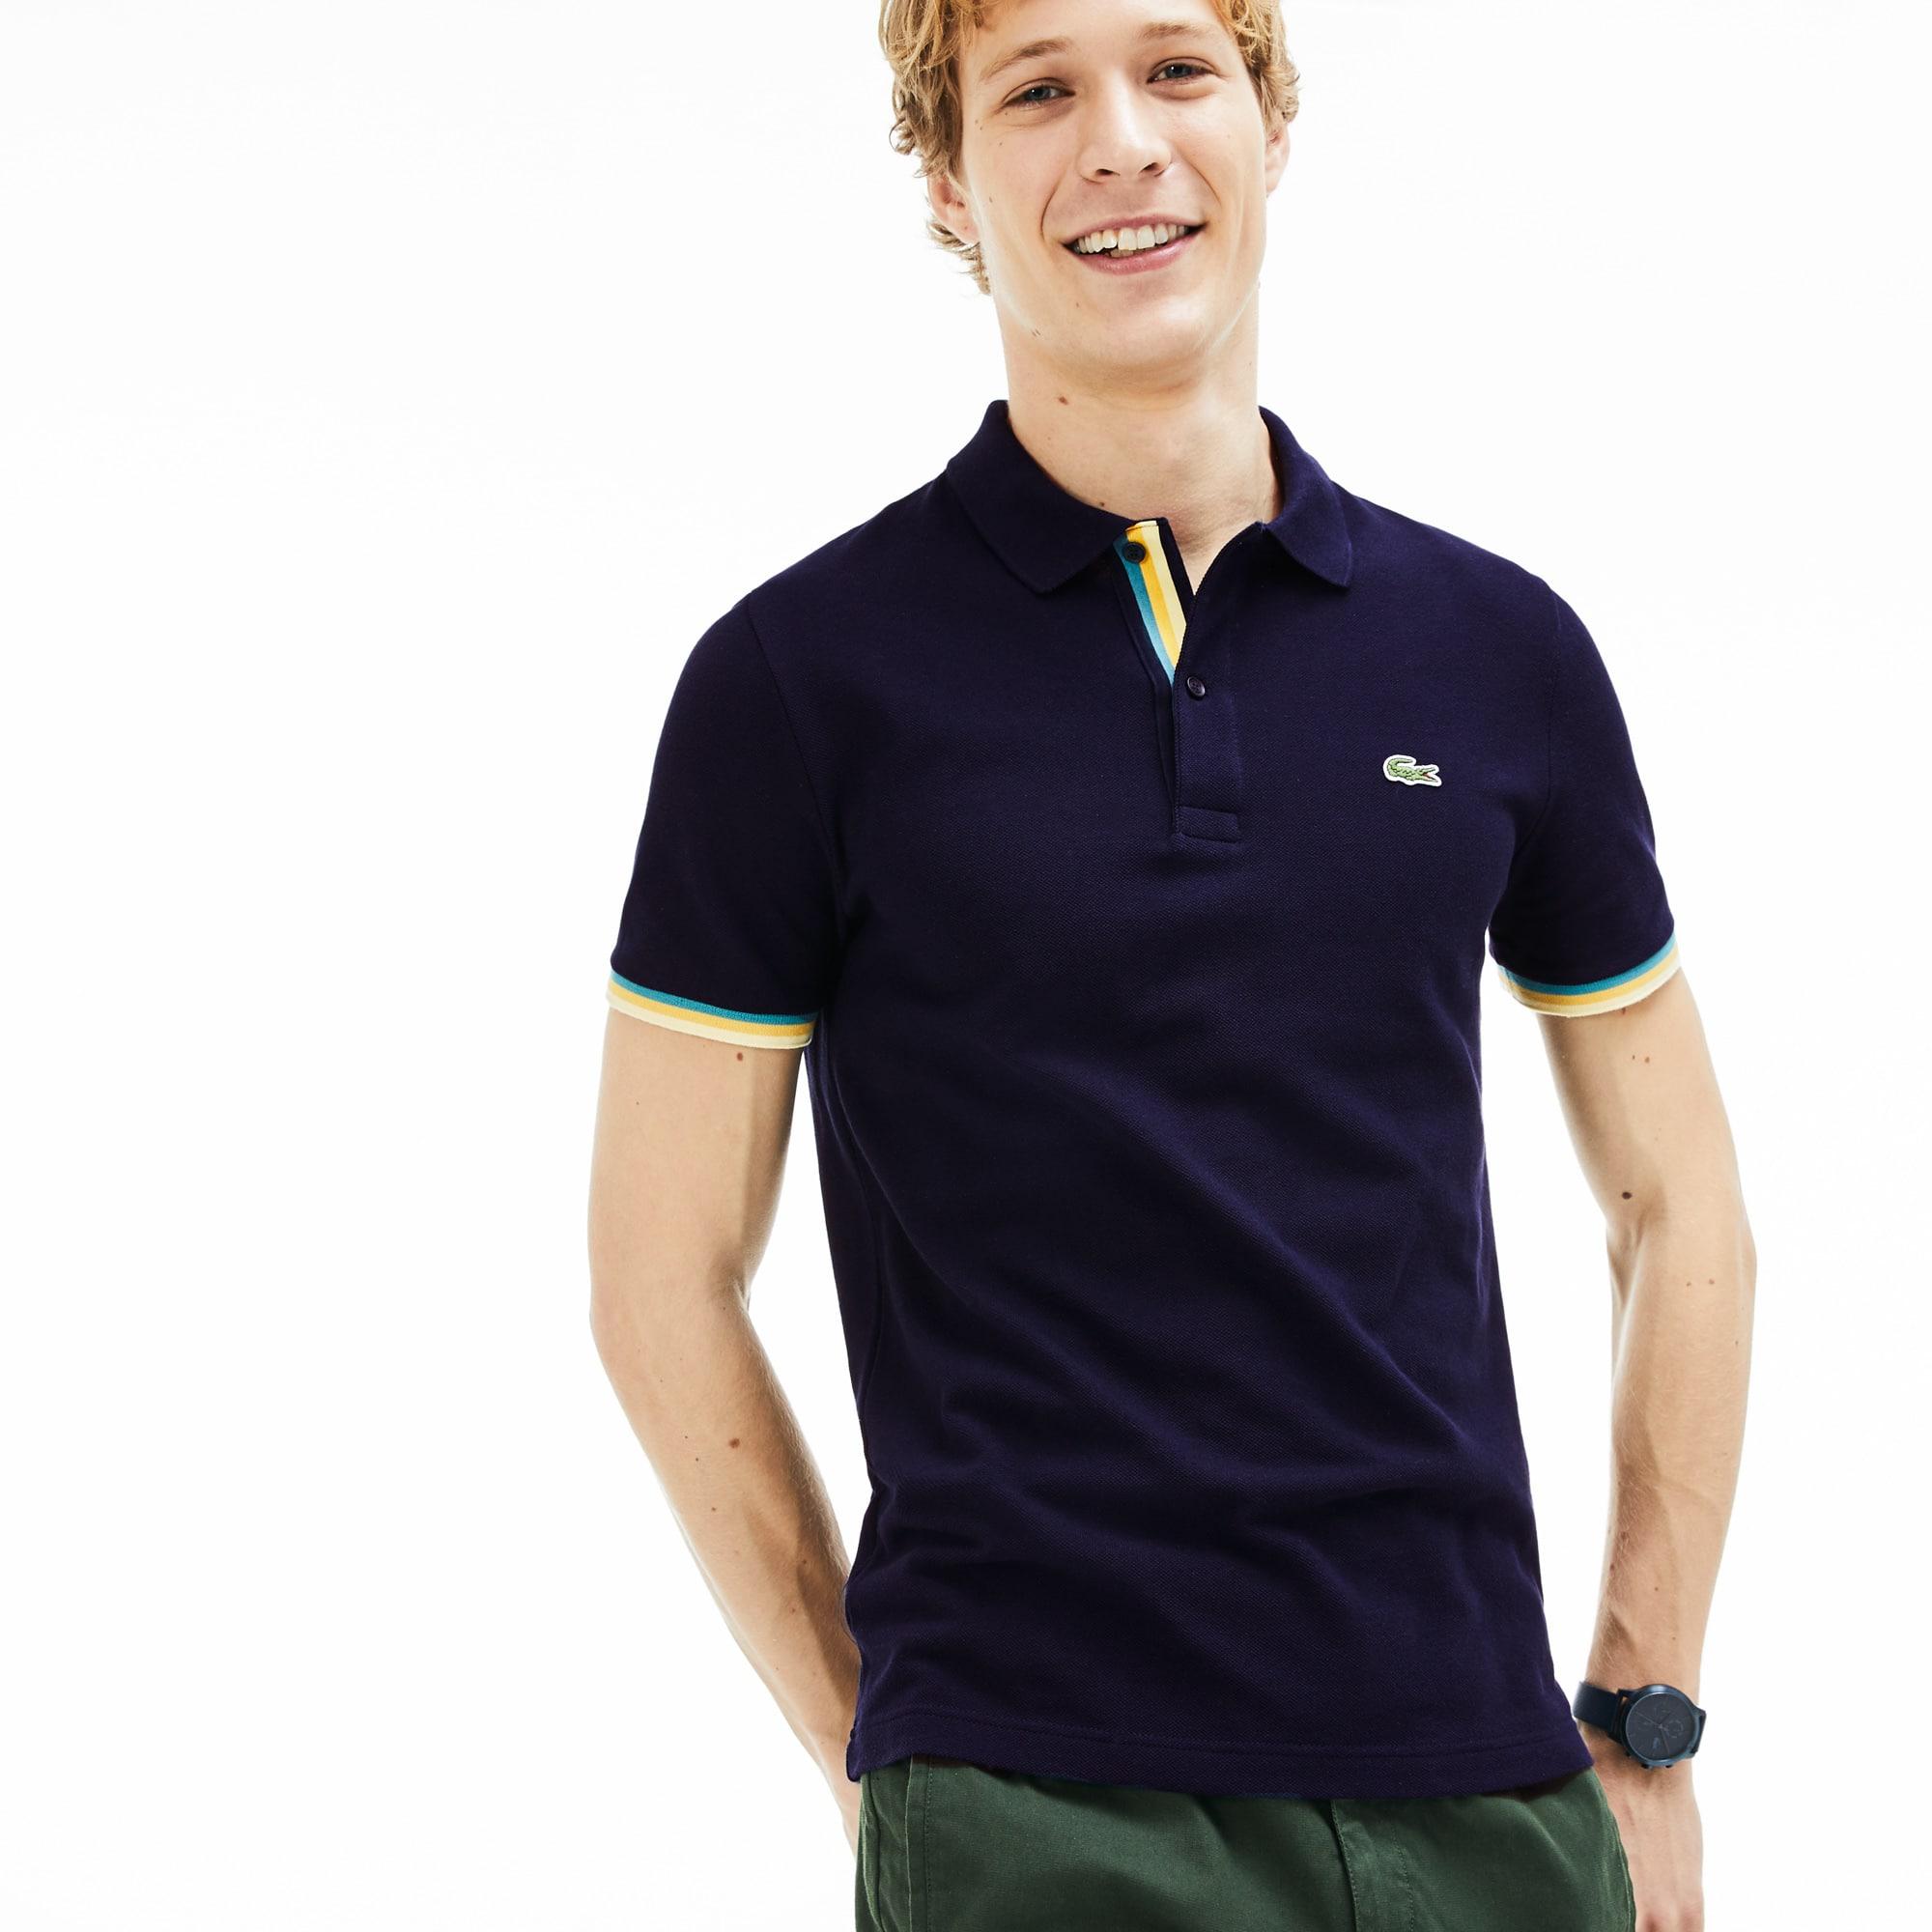 0cb7bce7e Men's Lacoste Slim Fit Piped Sleeves Petit Piqué Polo Shirt | LACOSTE